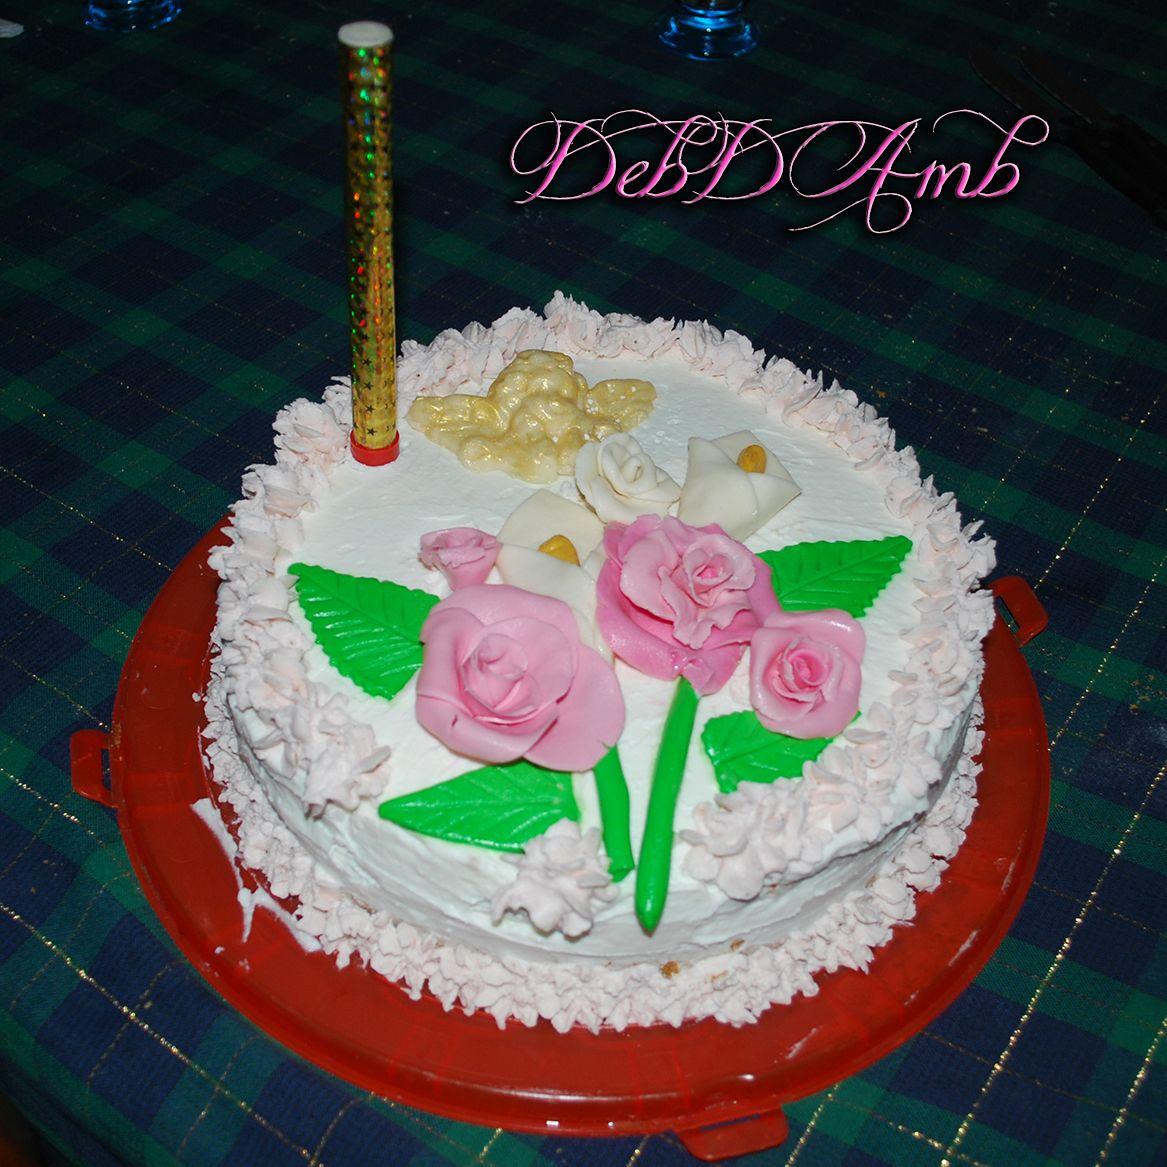 Angelas birthday cake